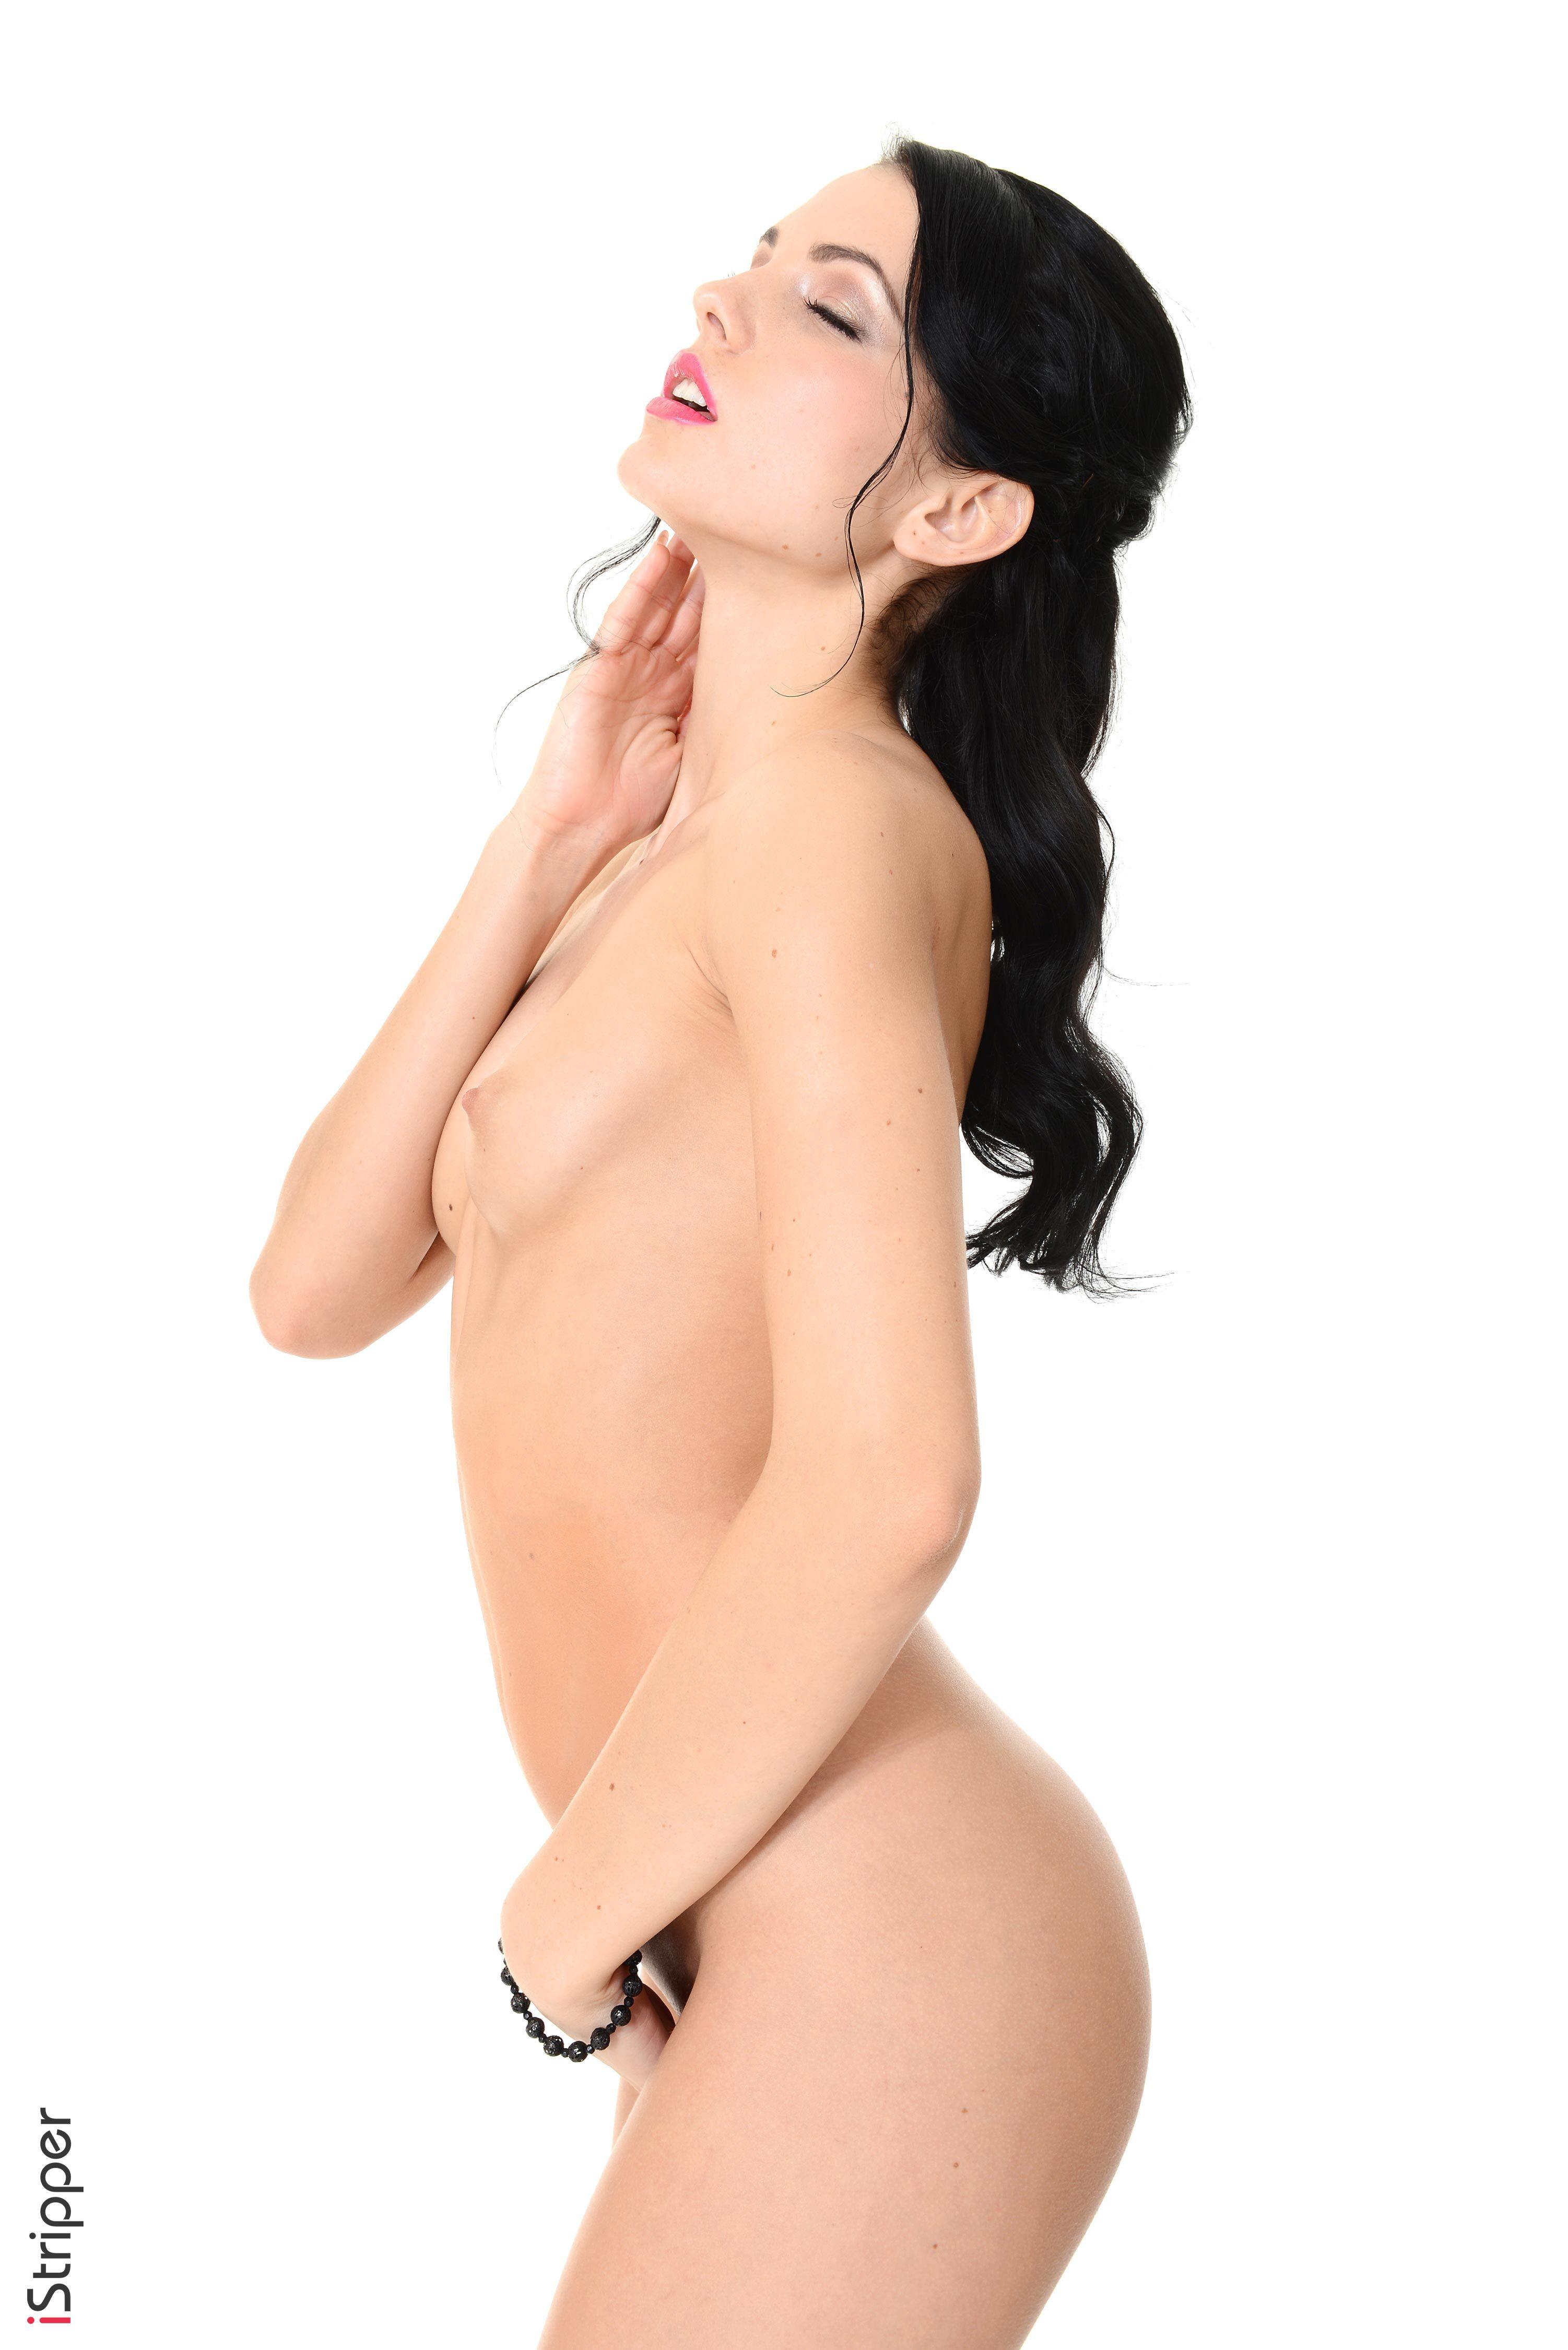 pink floyd naked pics